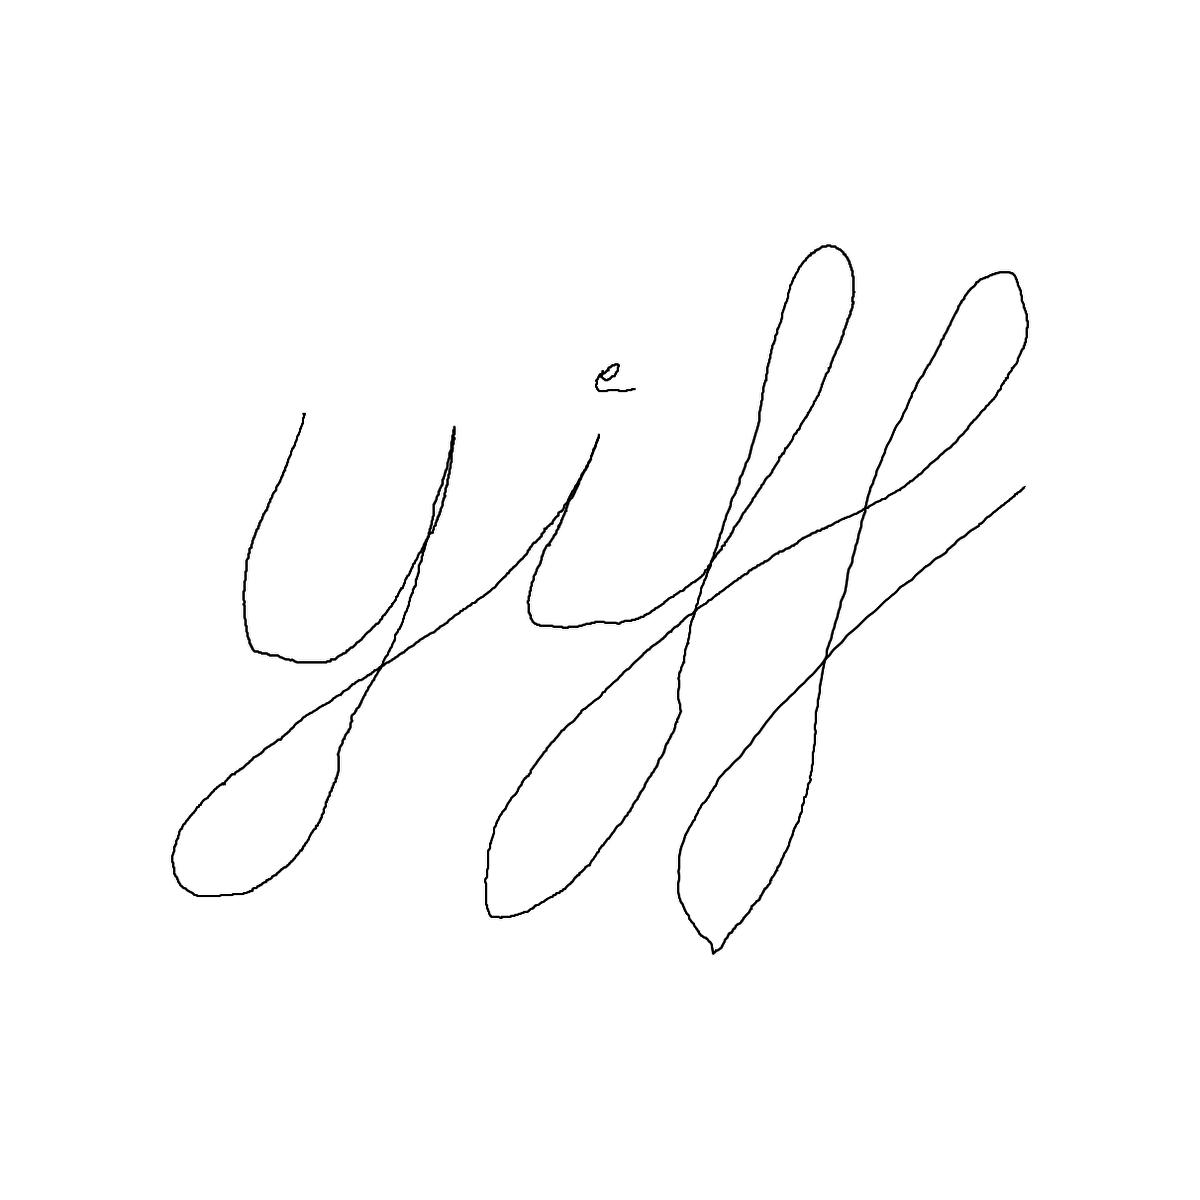 BAAAM drawing#23575 lat:75.9735488891601600lng: -105.9961013793945300